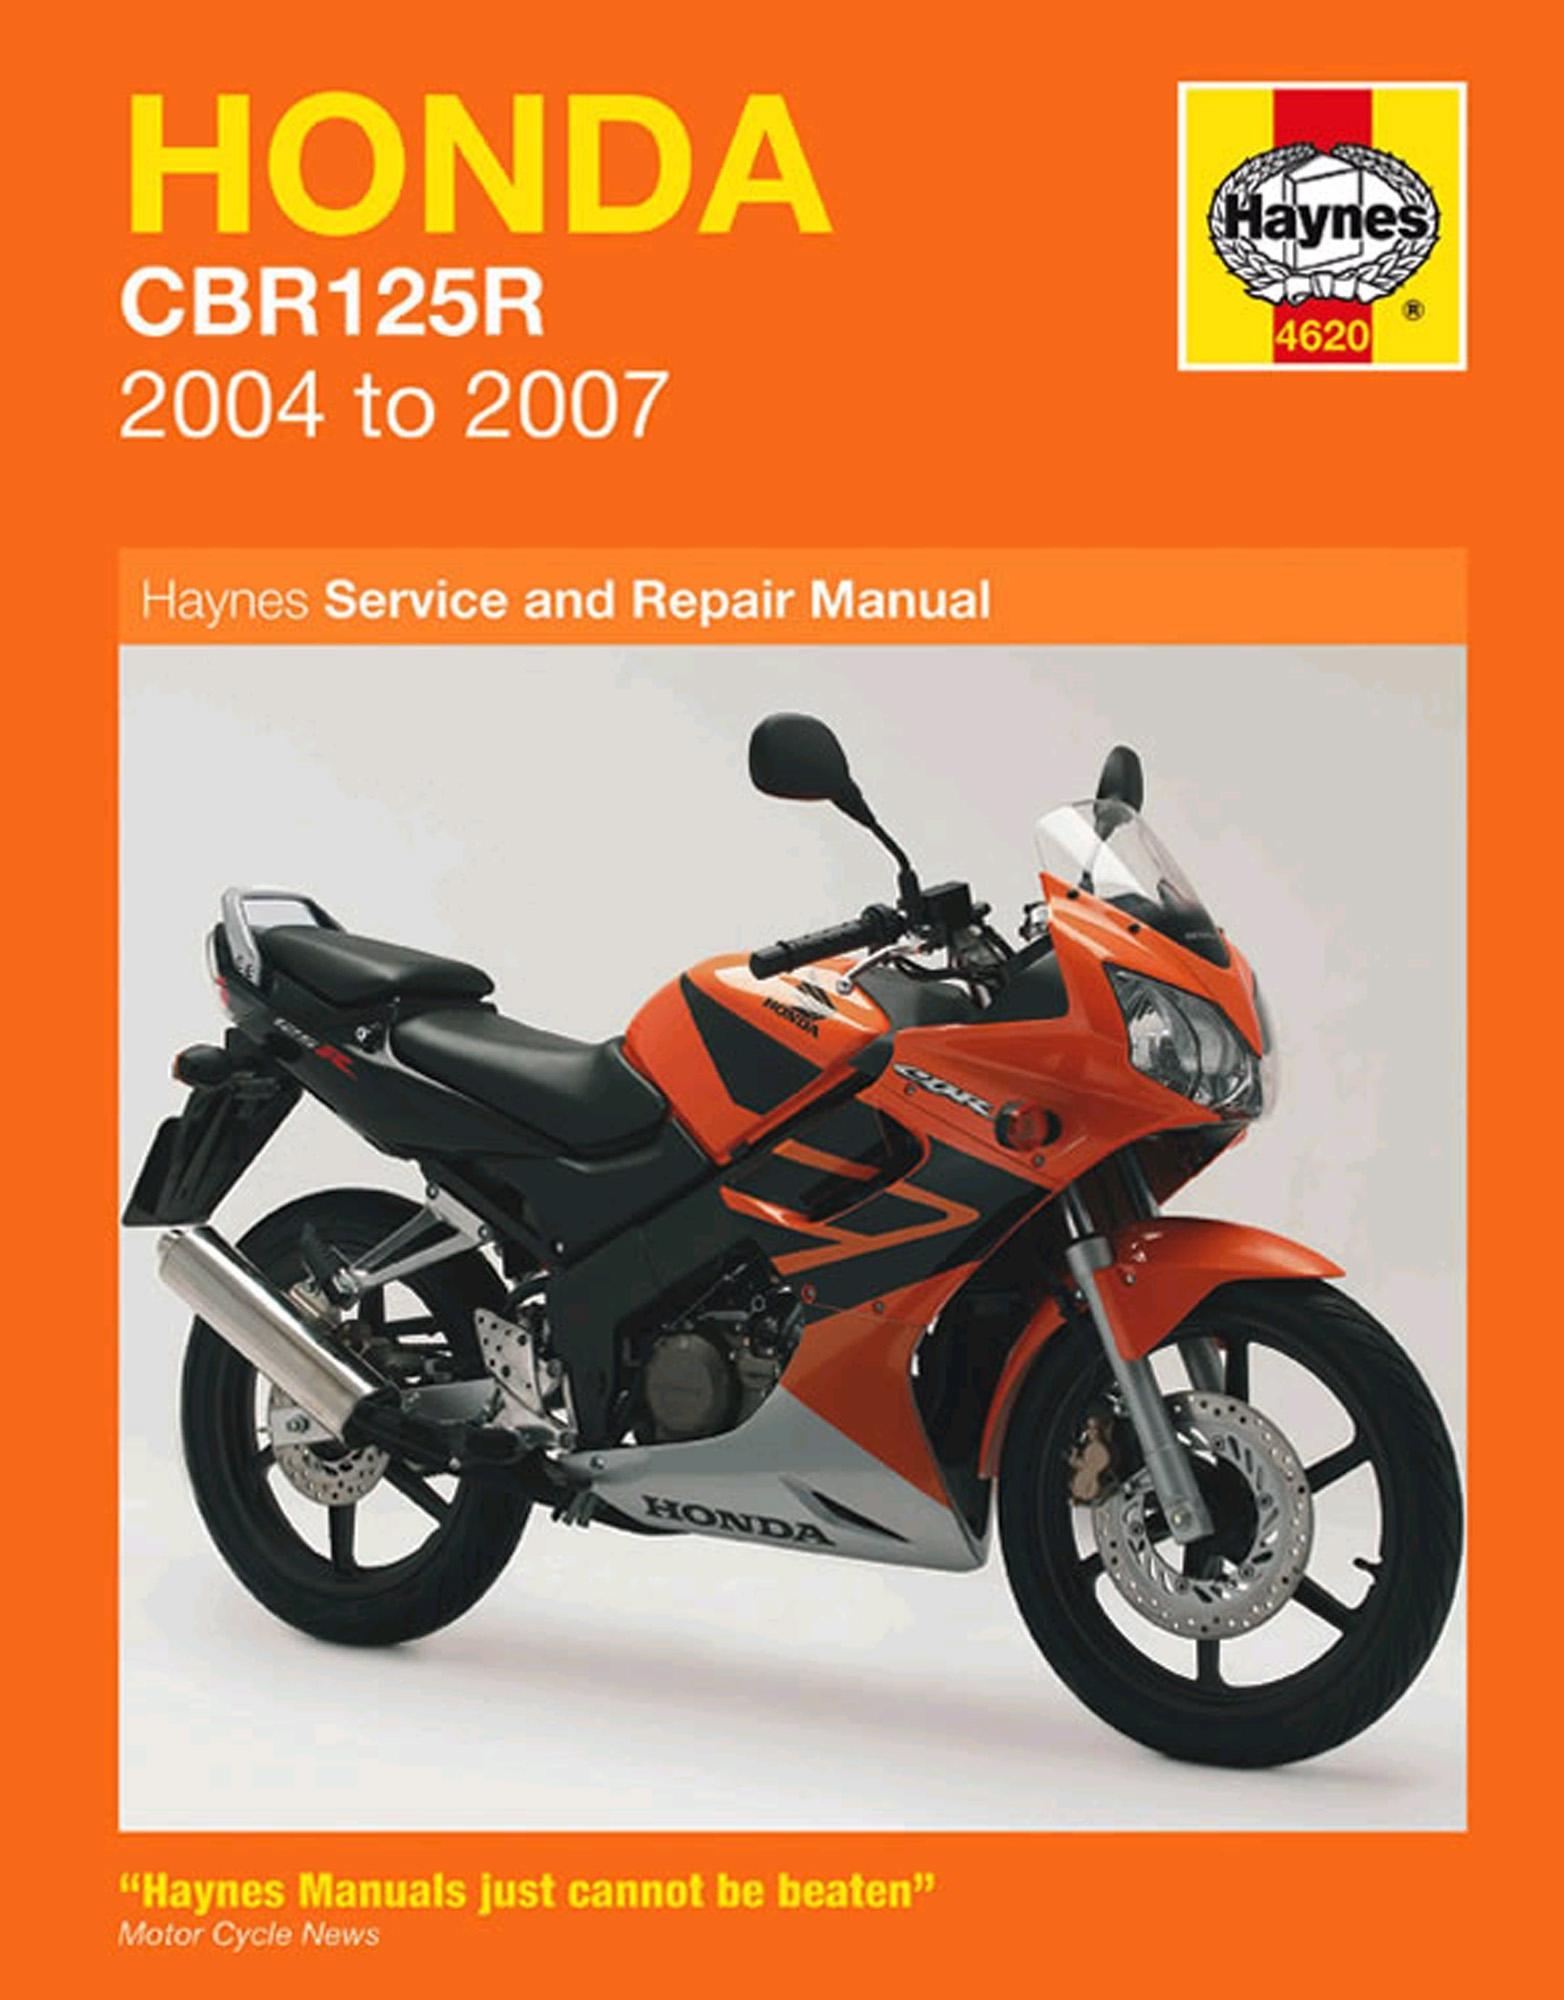 Haynes Service Repair Manual Honda CBR125R 2004 - 2007 Motorcycle  Maintenance